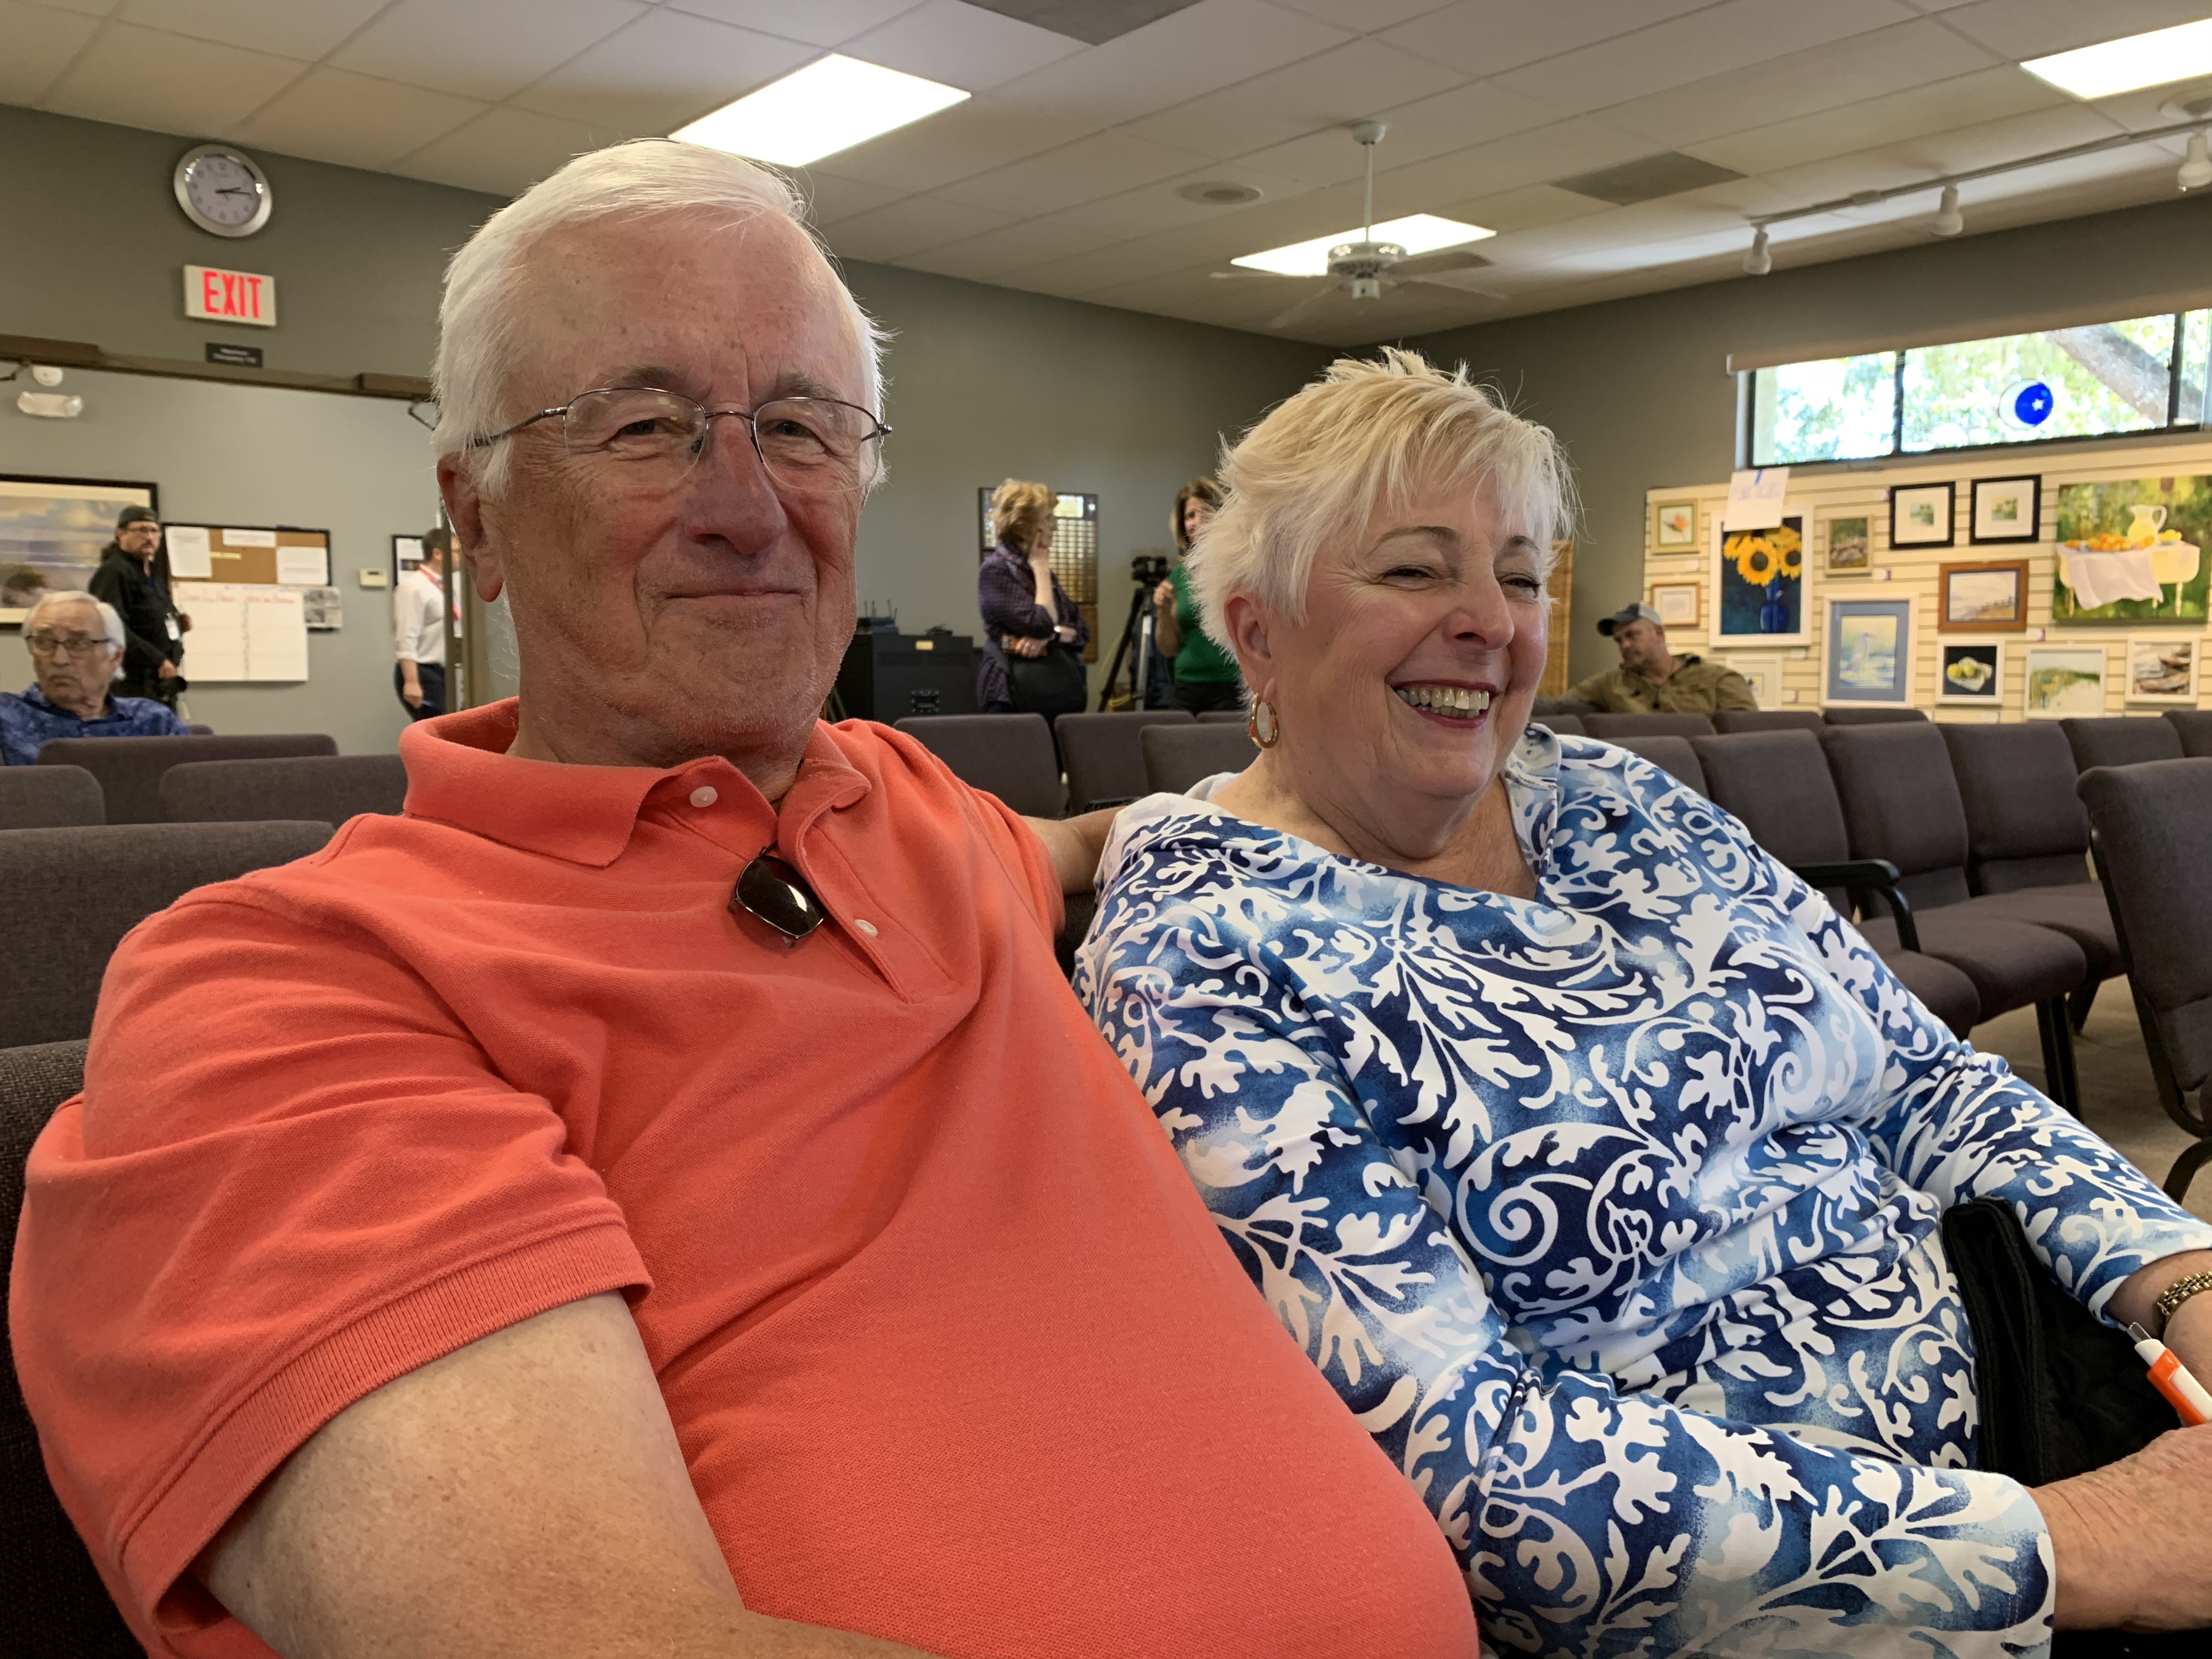 Richard and Linda Yach